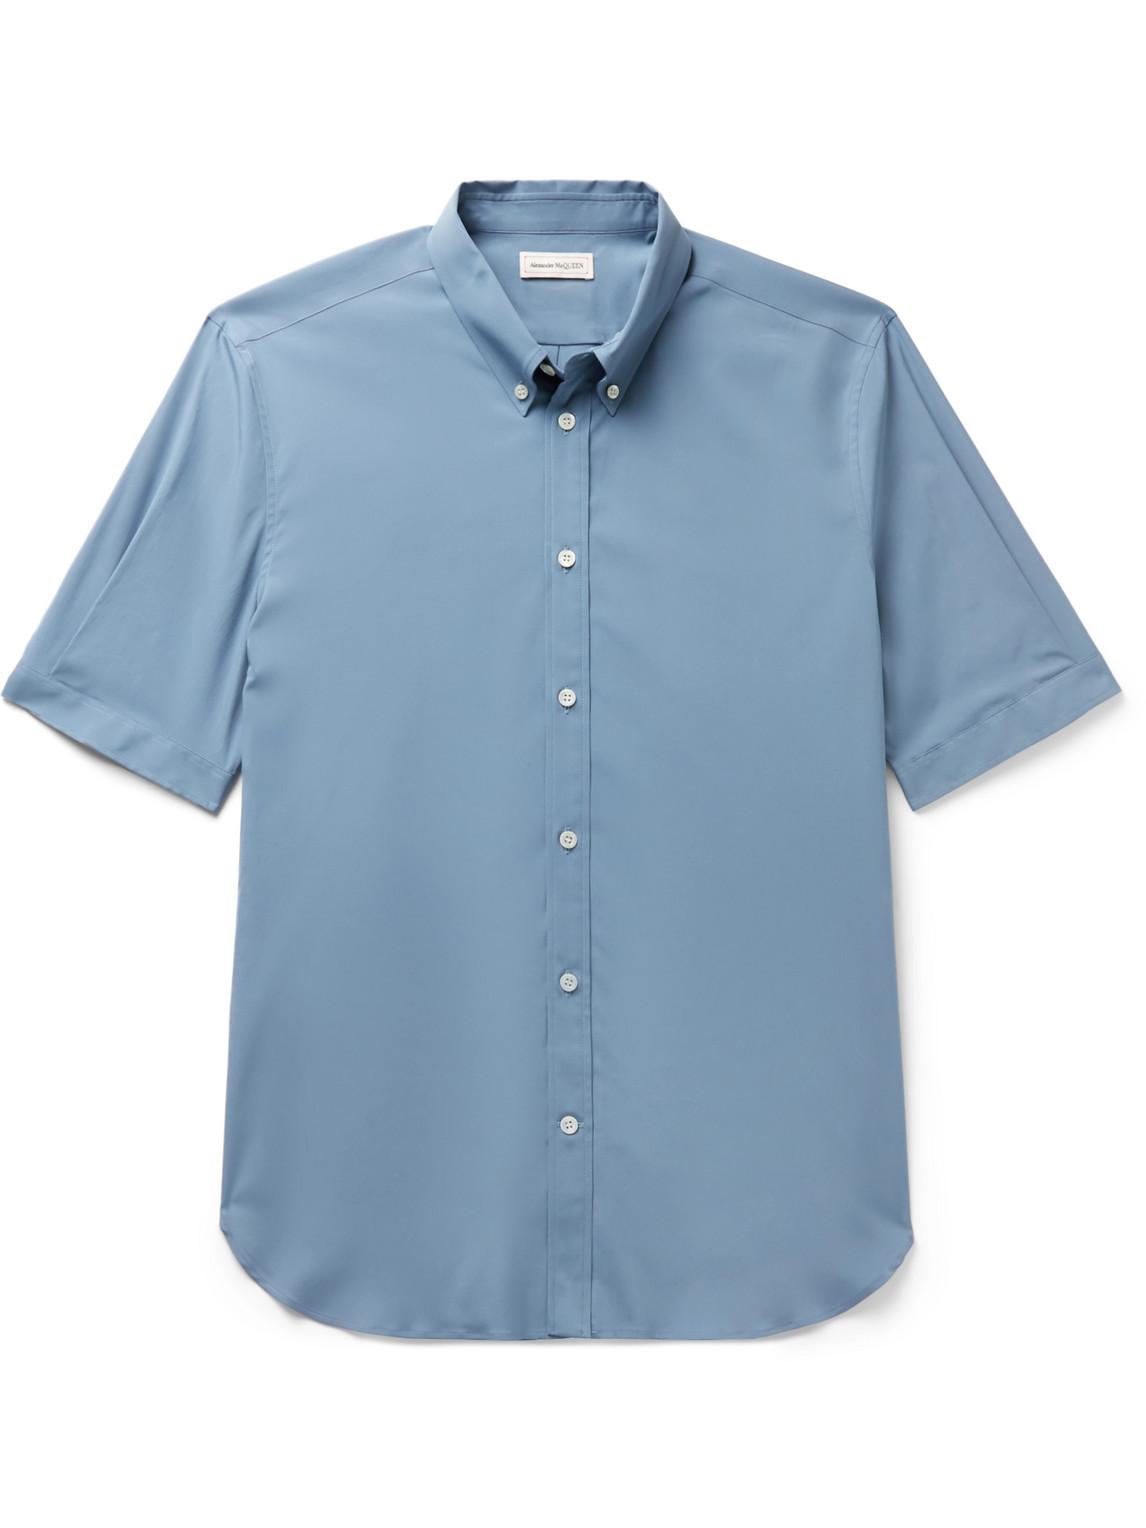 alexander mcqueen - slim-fit button-down collar stretch-cotton poplin shirt - men - blue - uk/us 15.5